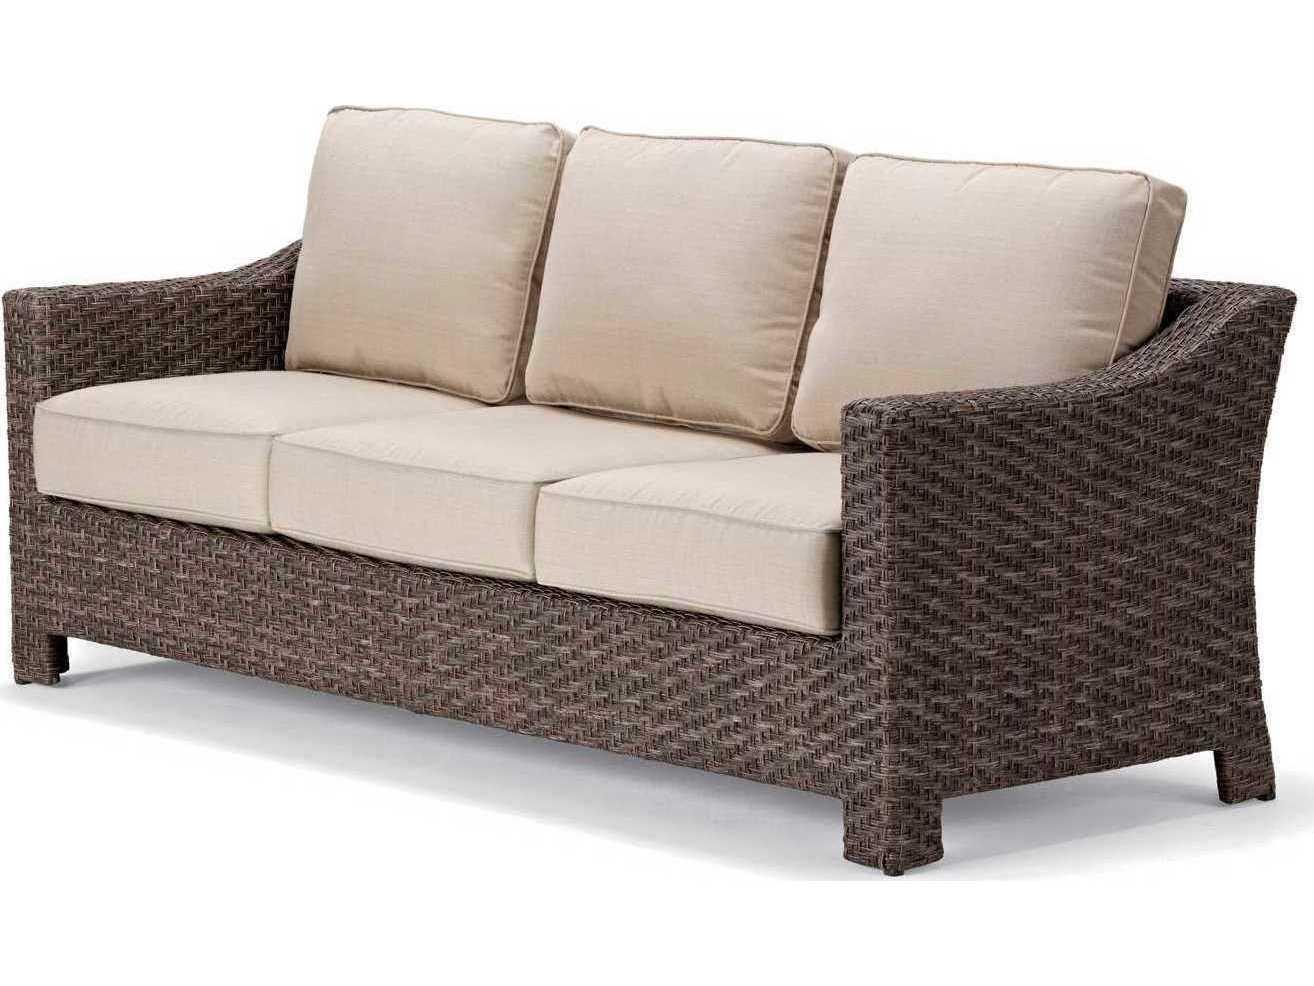 replacement garden sofa cushions simples e barato telescope casual lake shore seat and back